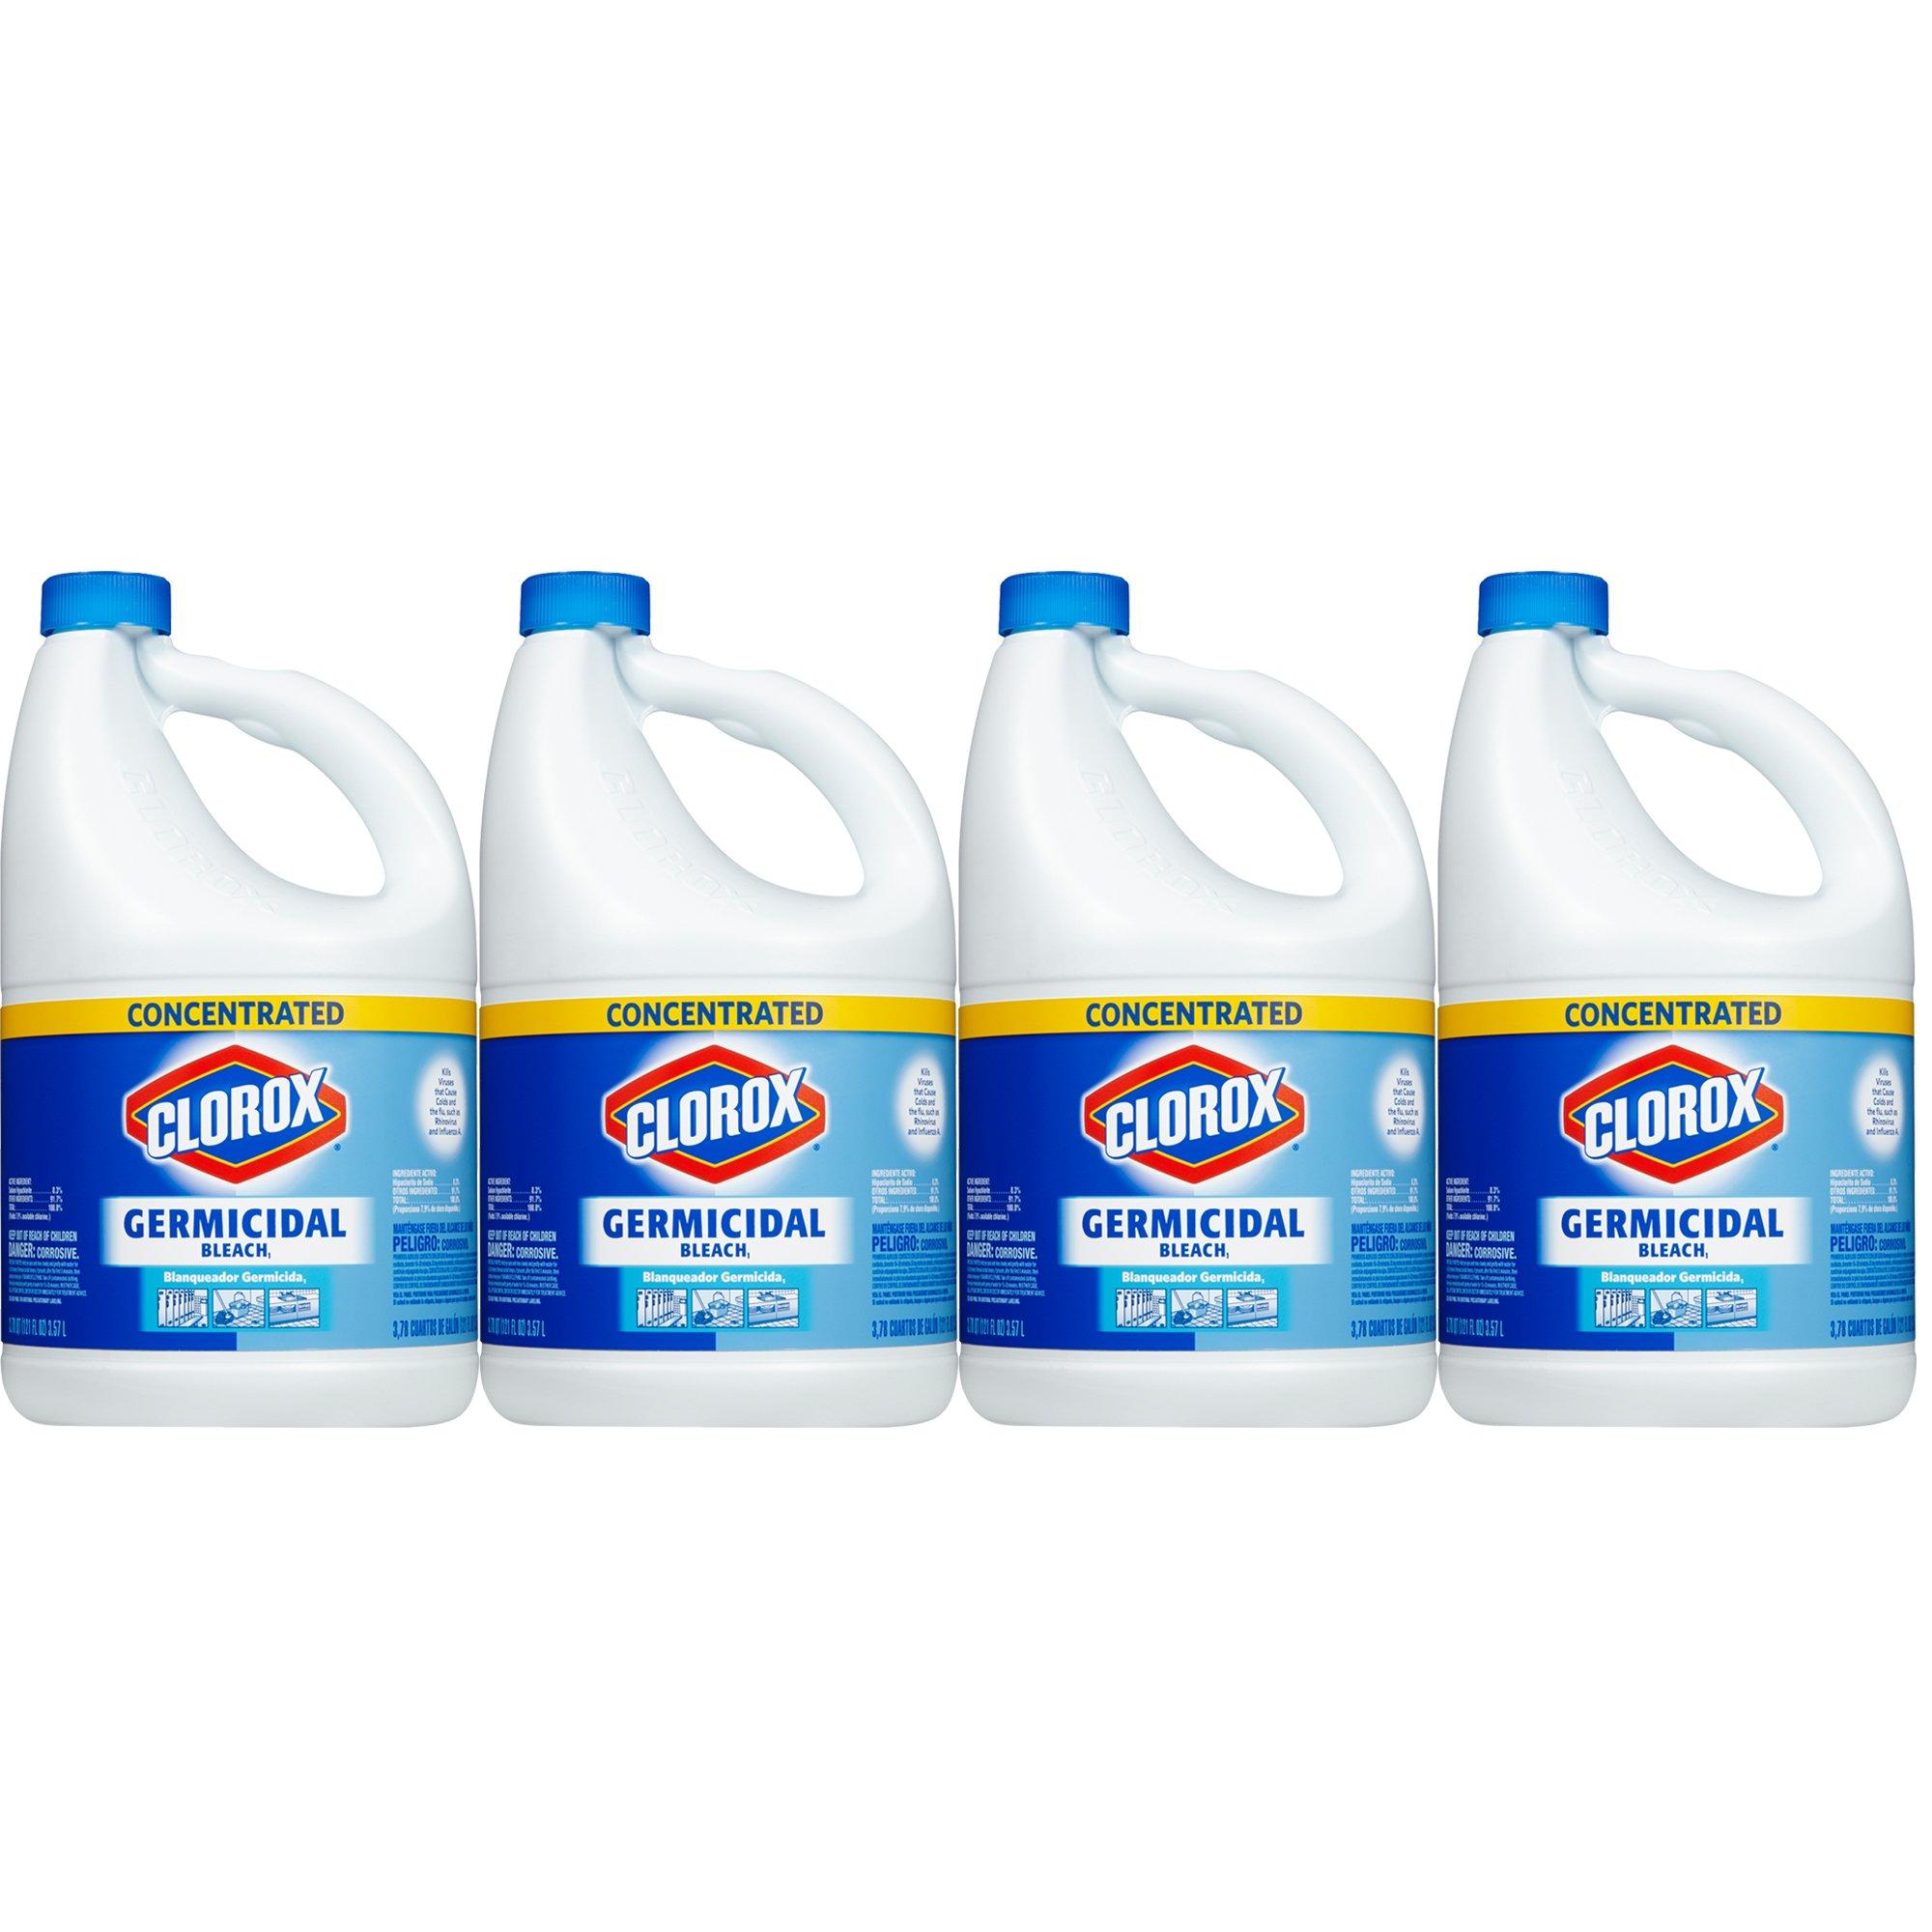 Clorox Germicidal Concentrated Liquid Bleach, 121 oz, 4-Pack